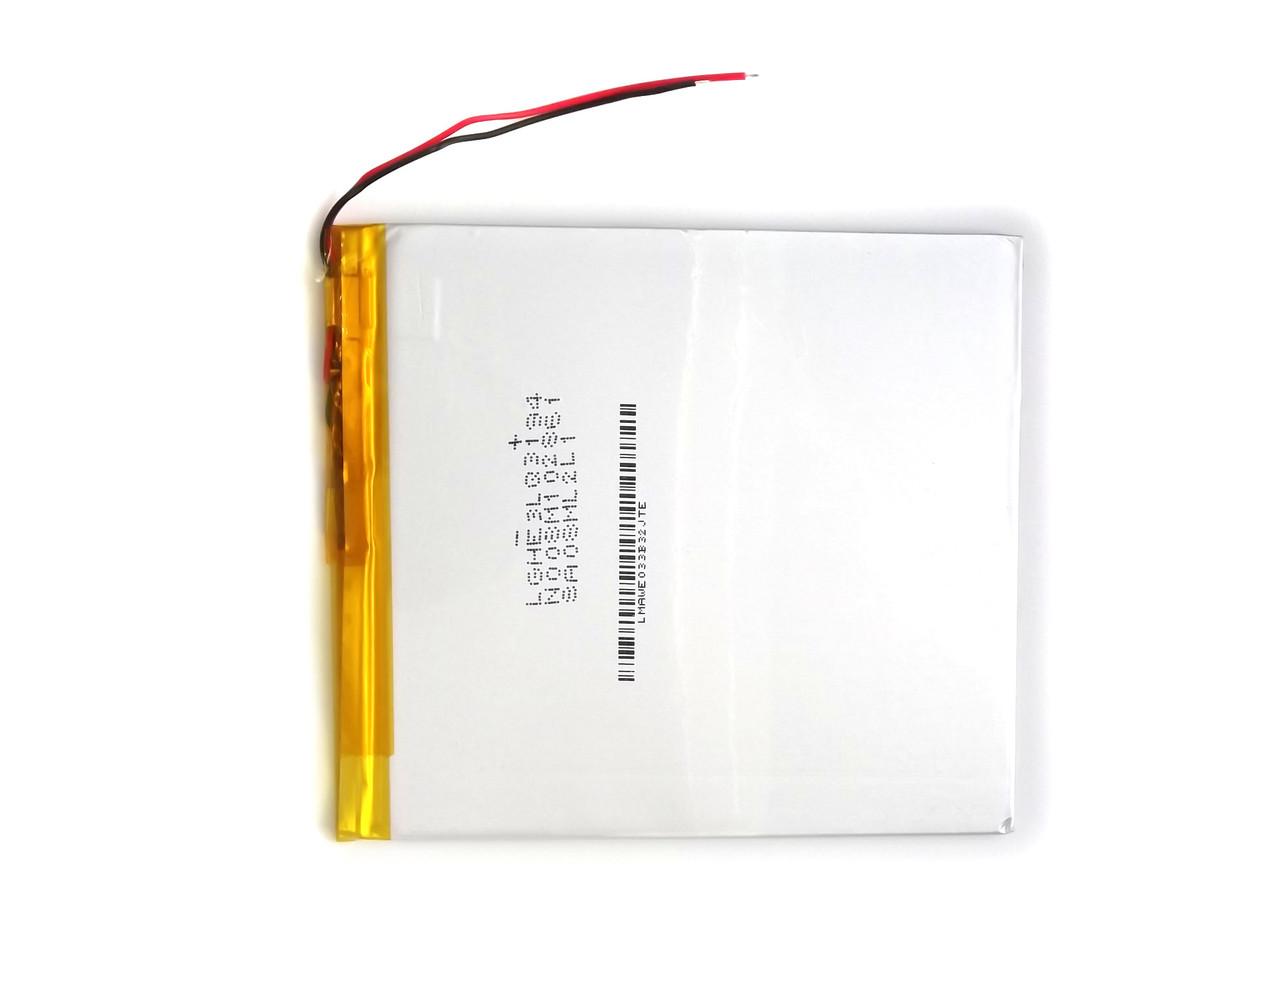 Аккумулятор 4500mAh 3.7v 5565125 для планшетов